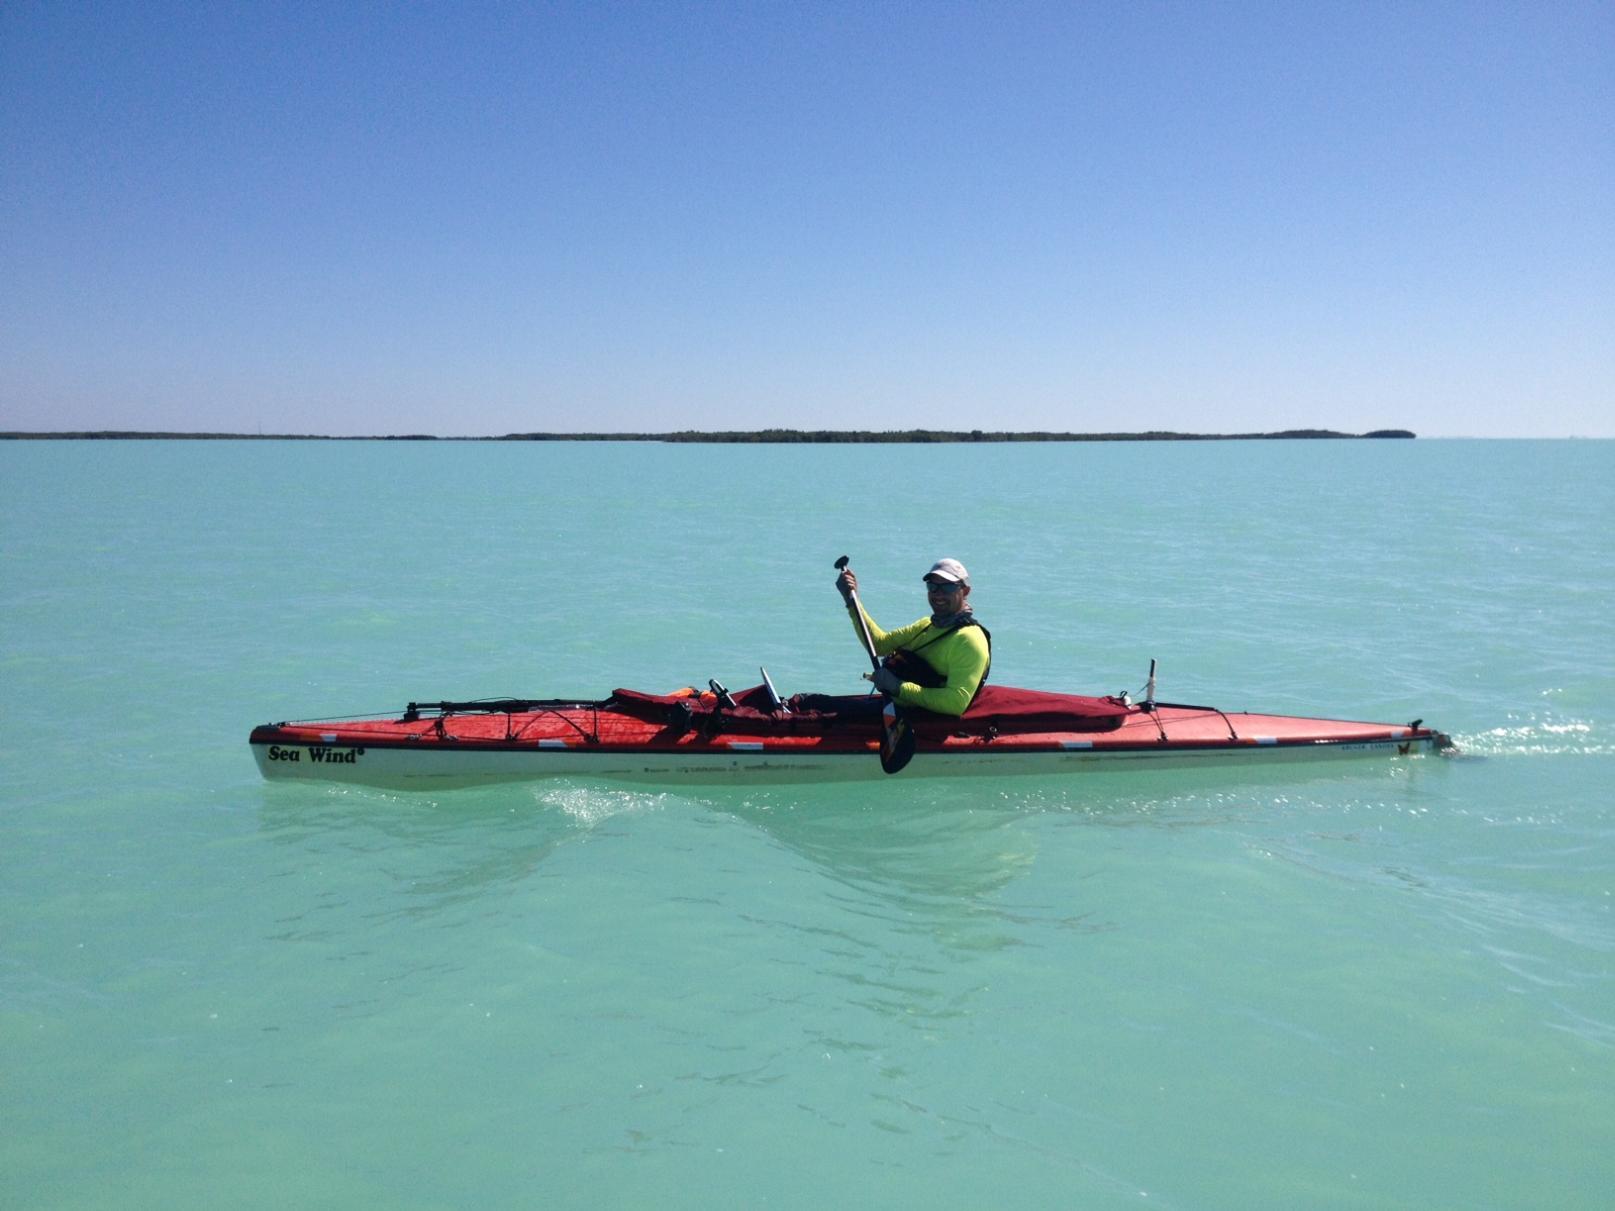 Bwca fishing kayak vs canoe boundary waters gear forum for Canoe vs kayak fishing